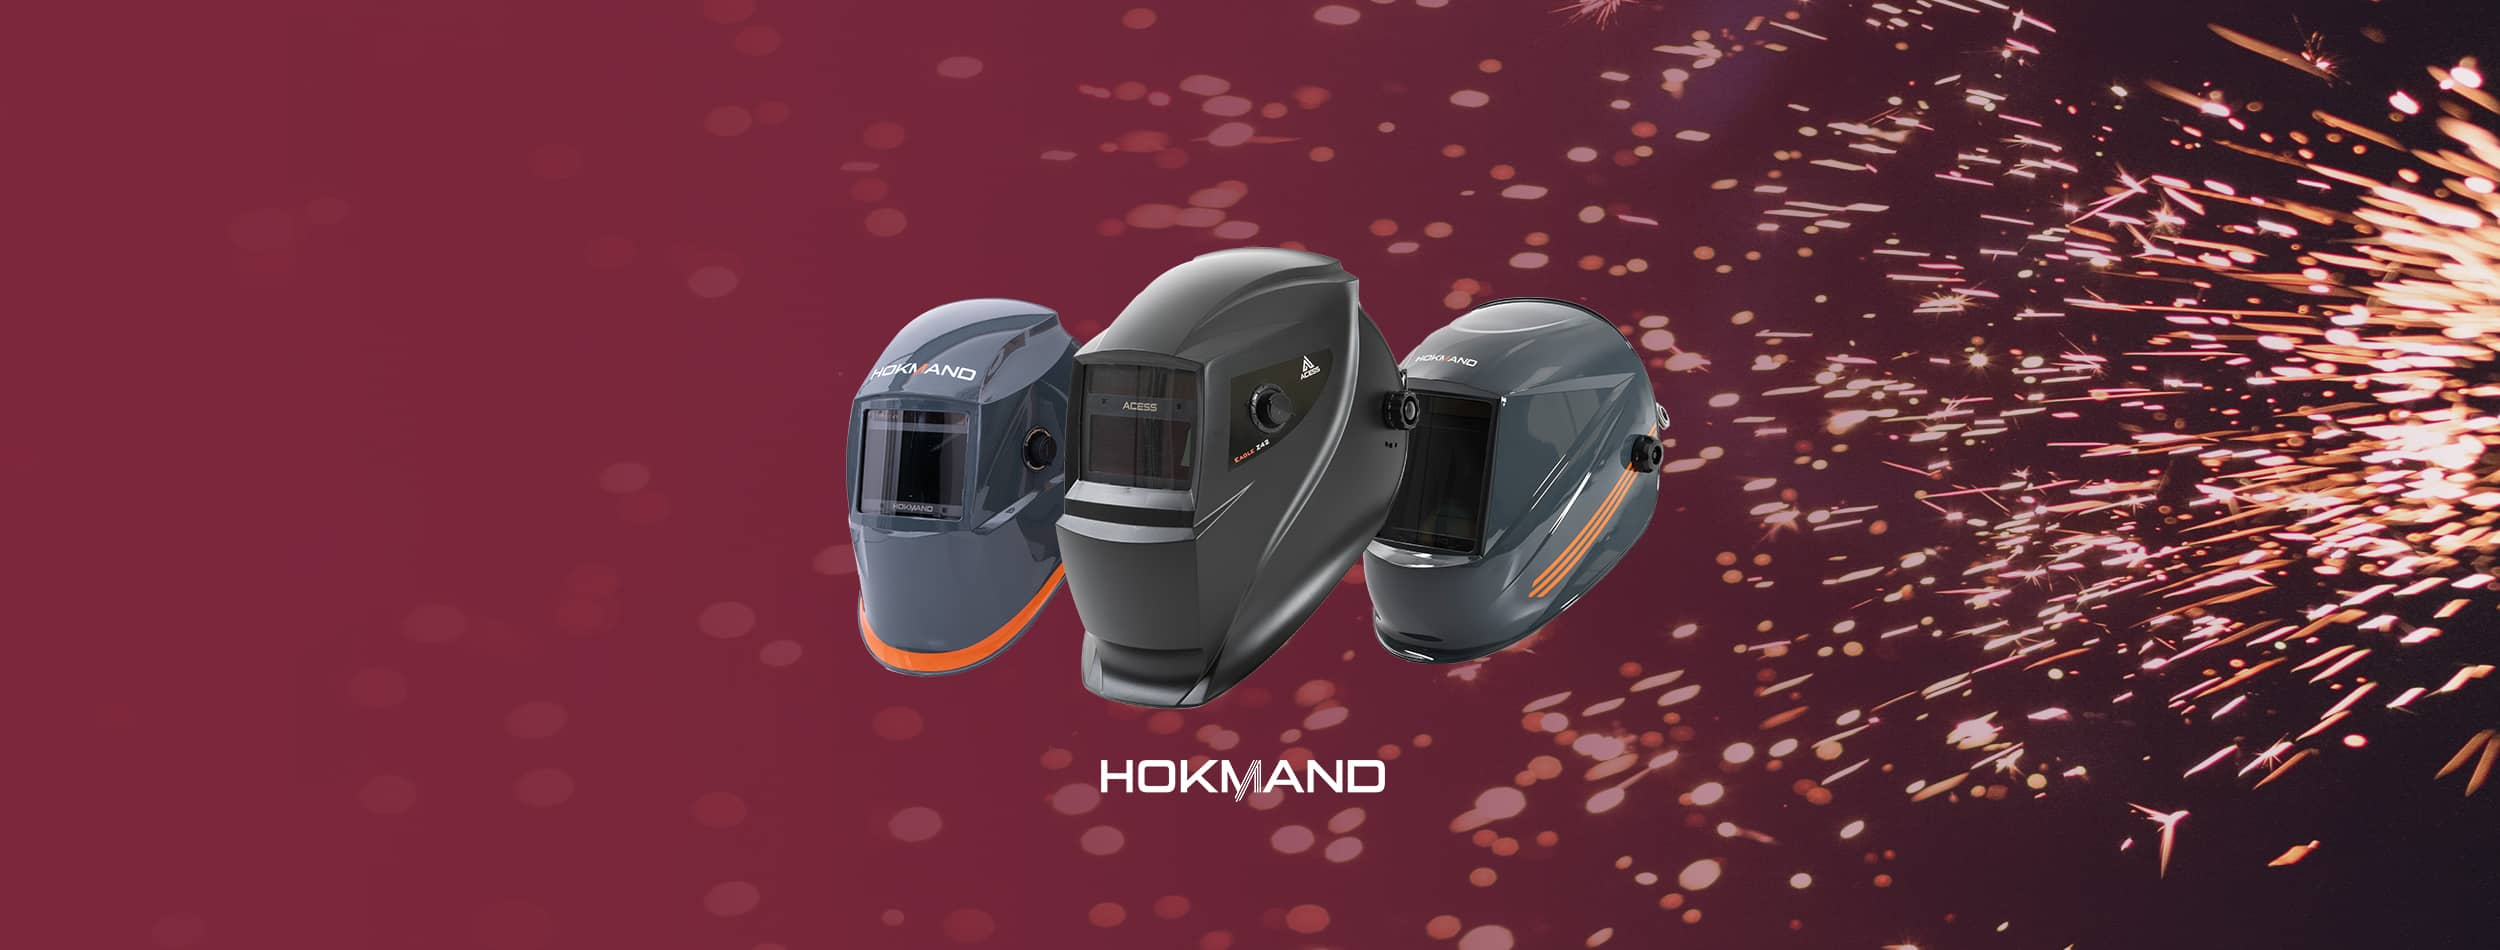 Pantallas automaticas de soldadura Hokmand